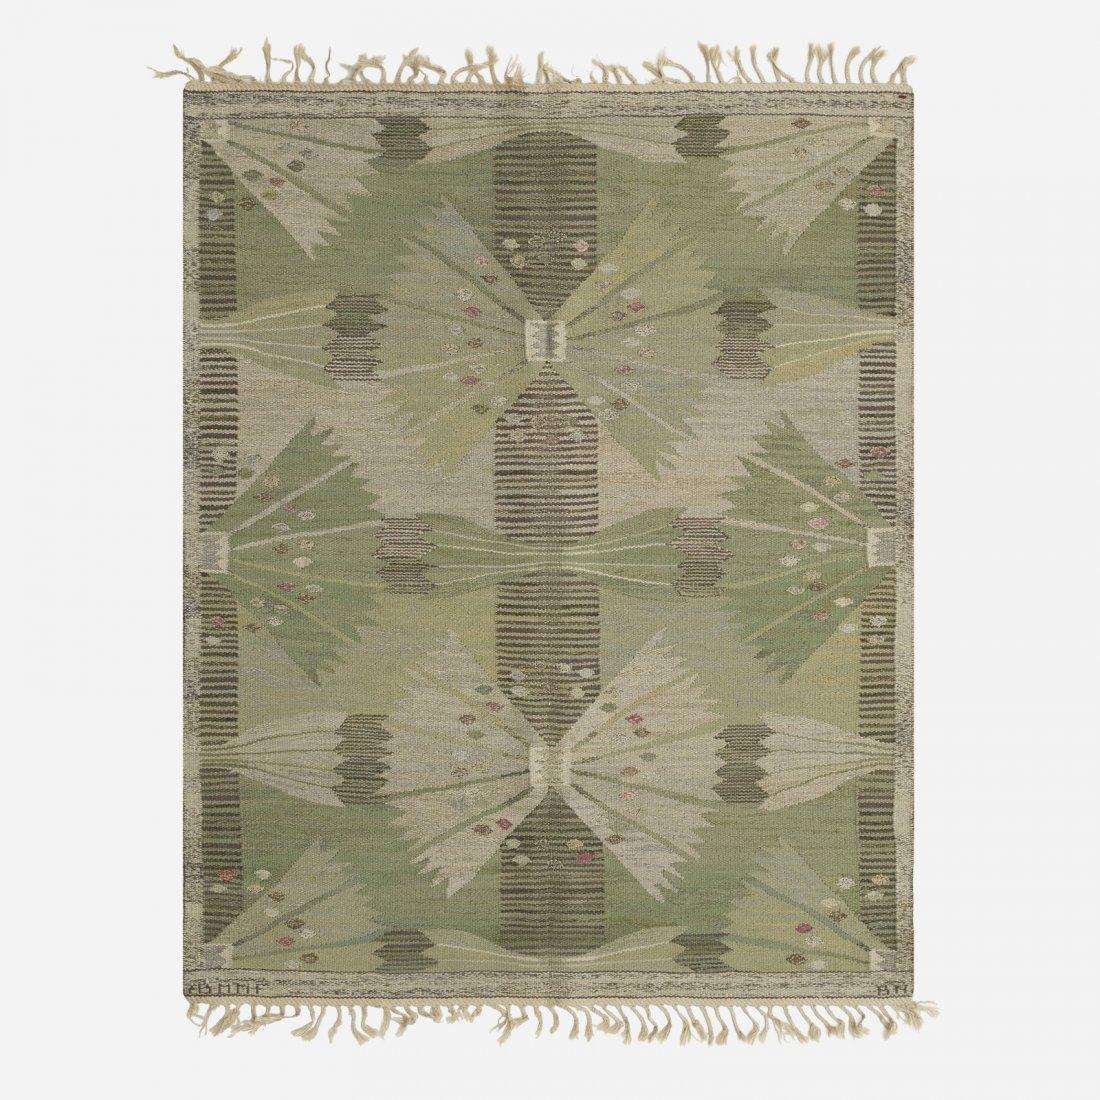 Barbro Nilsson, The Park, Falkman tapestry weave carpet